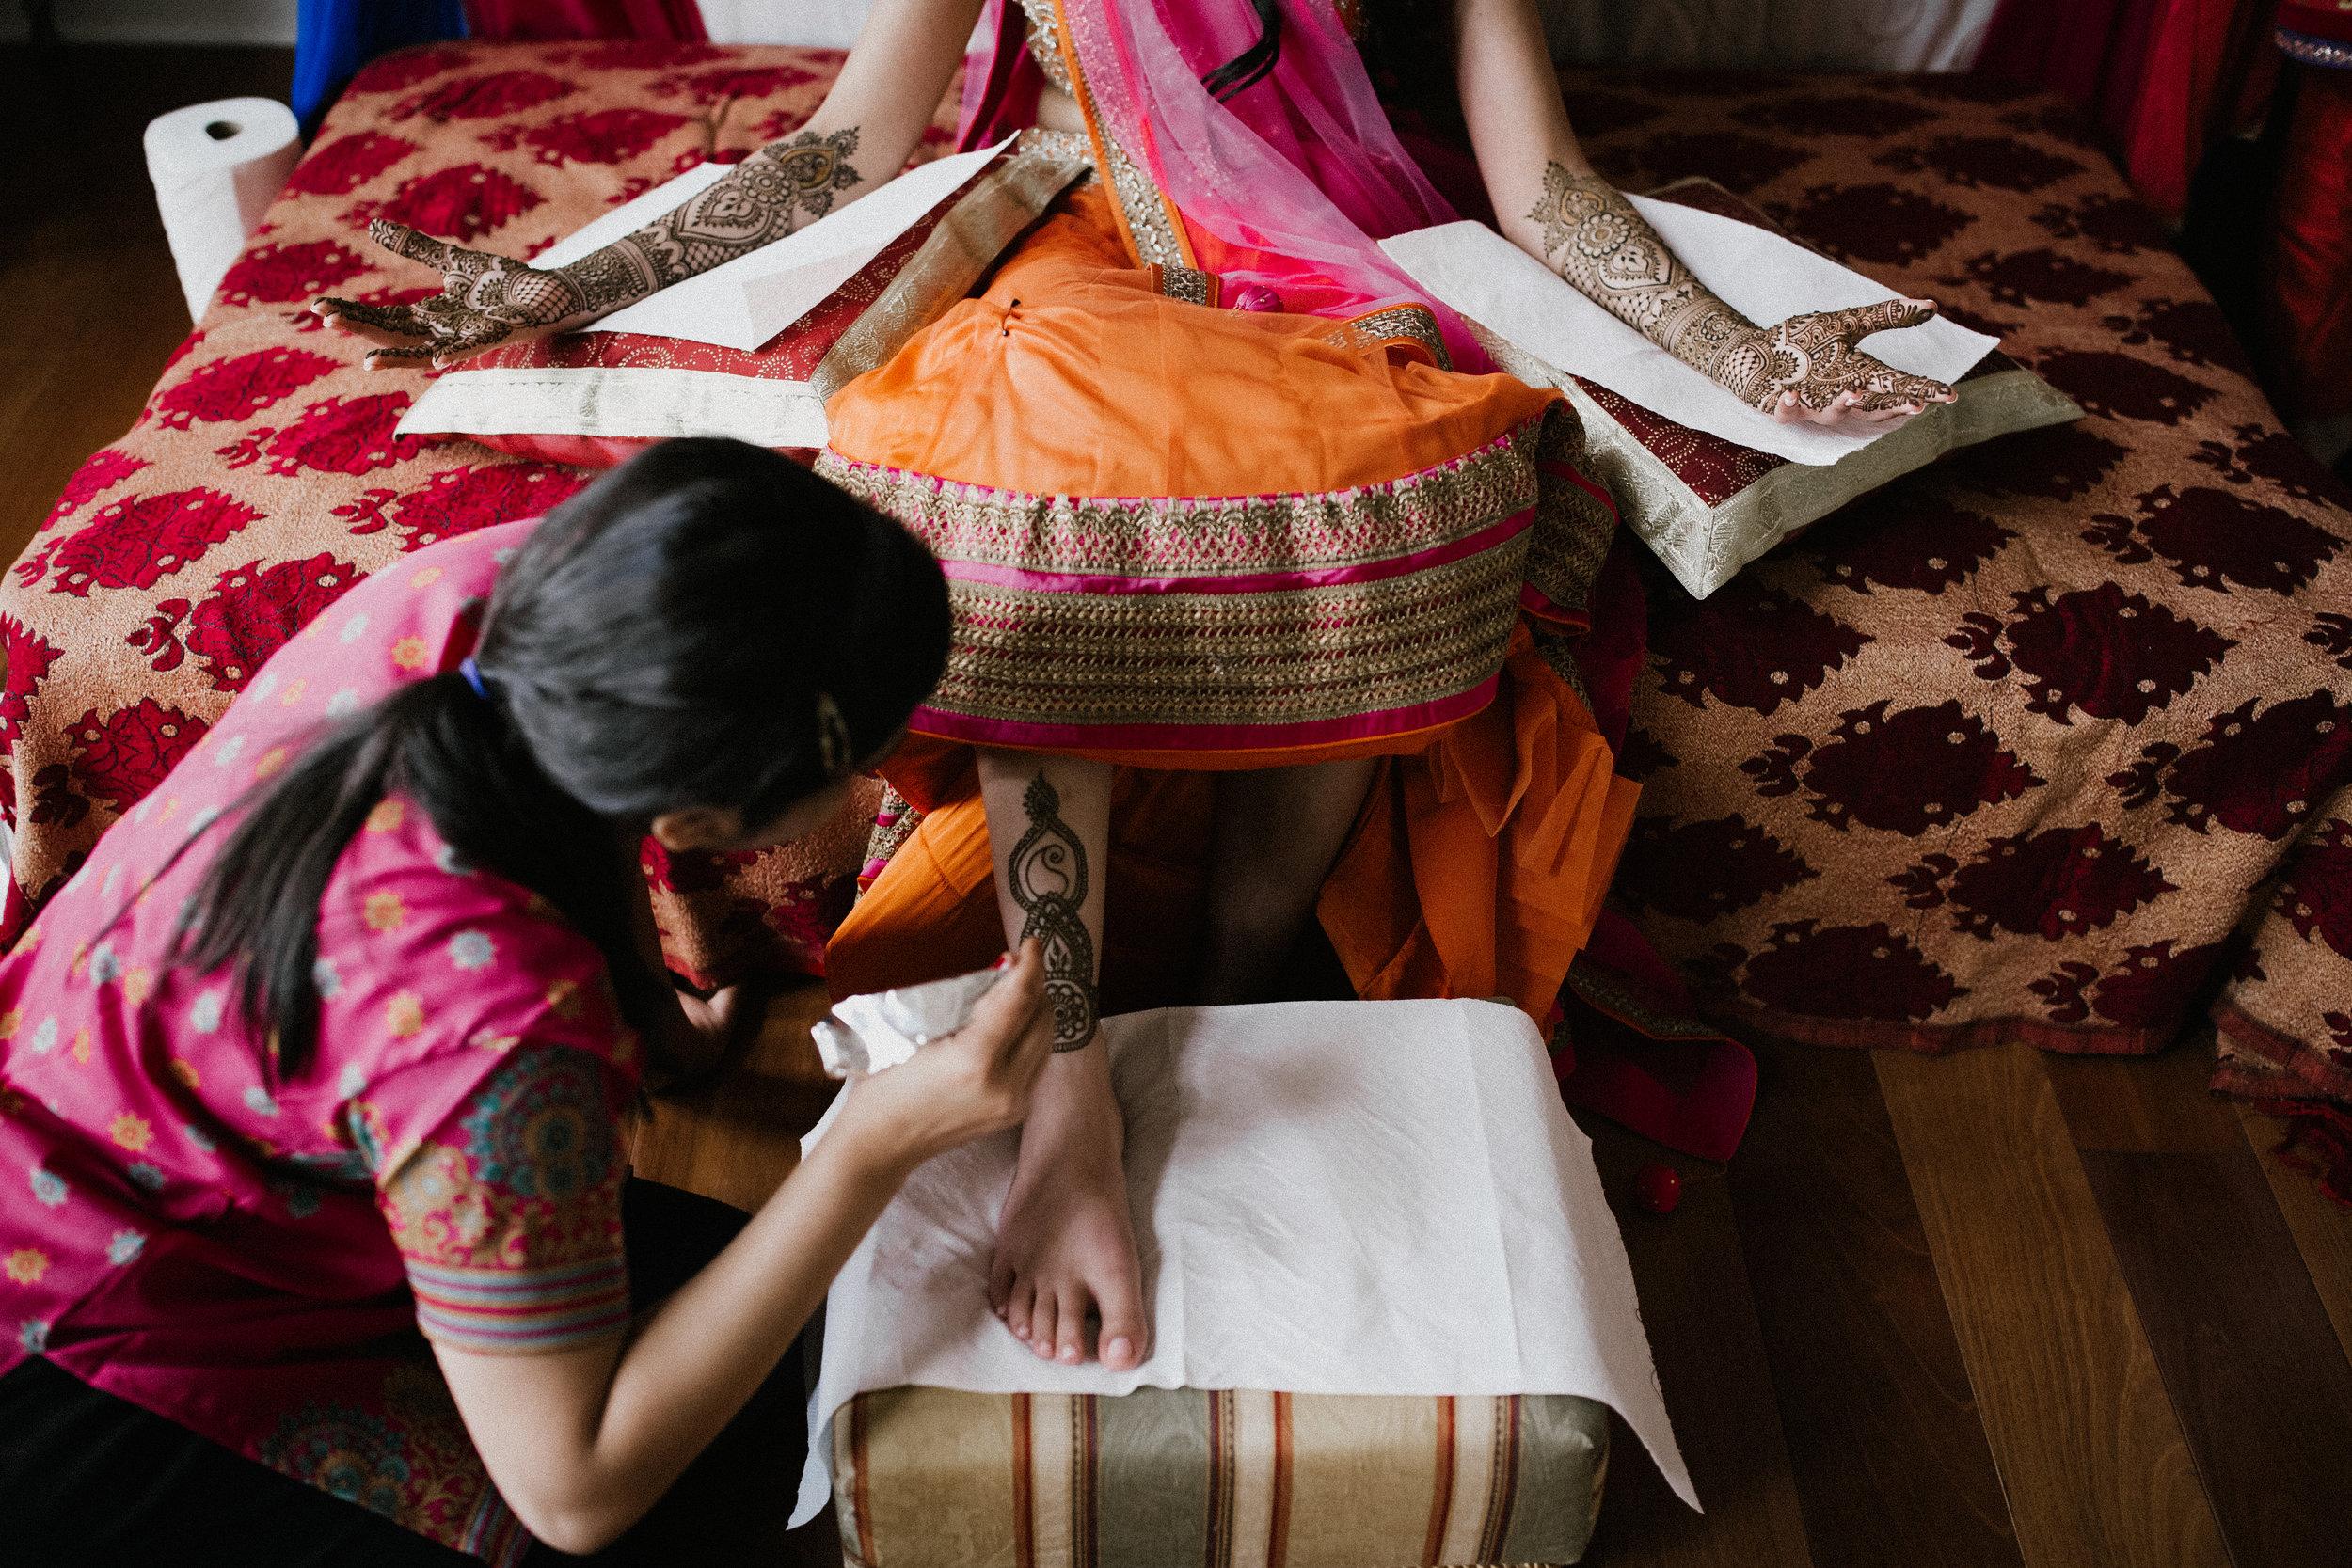 Aparna-Ankit-Patel-Mehndi-Wedding-Photos-0008.jpg